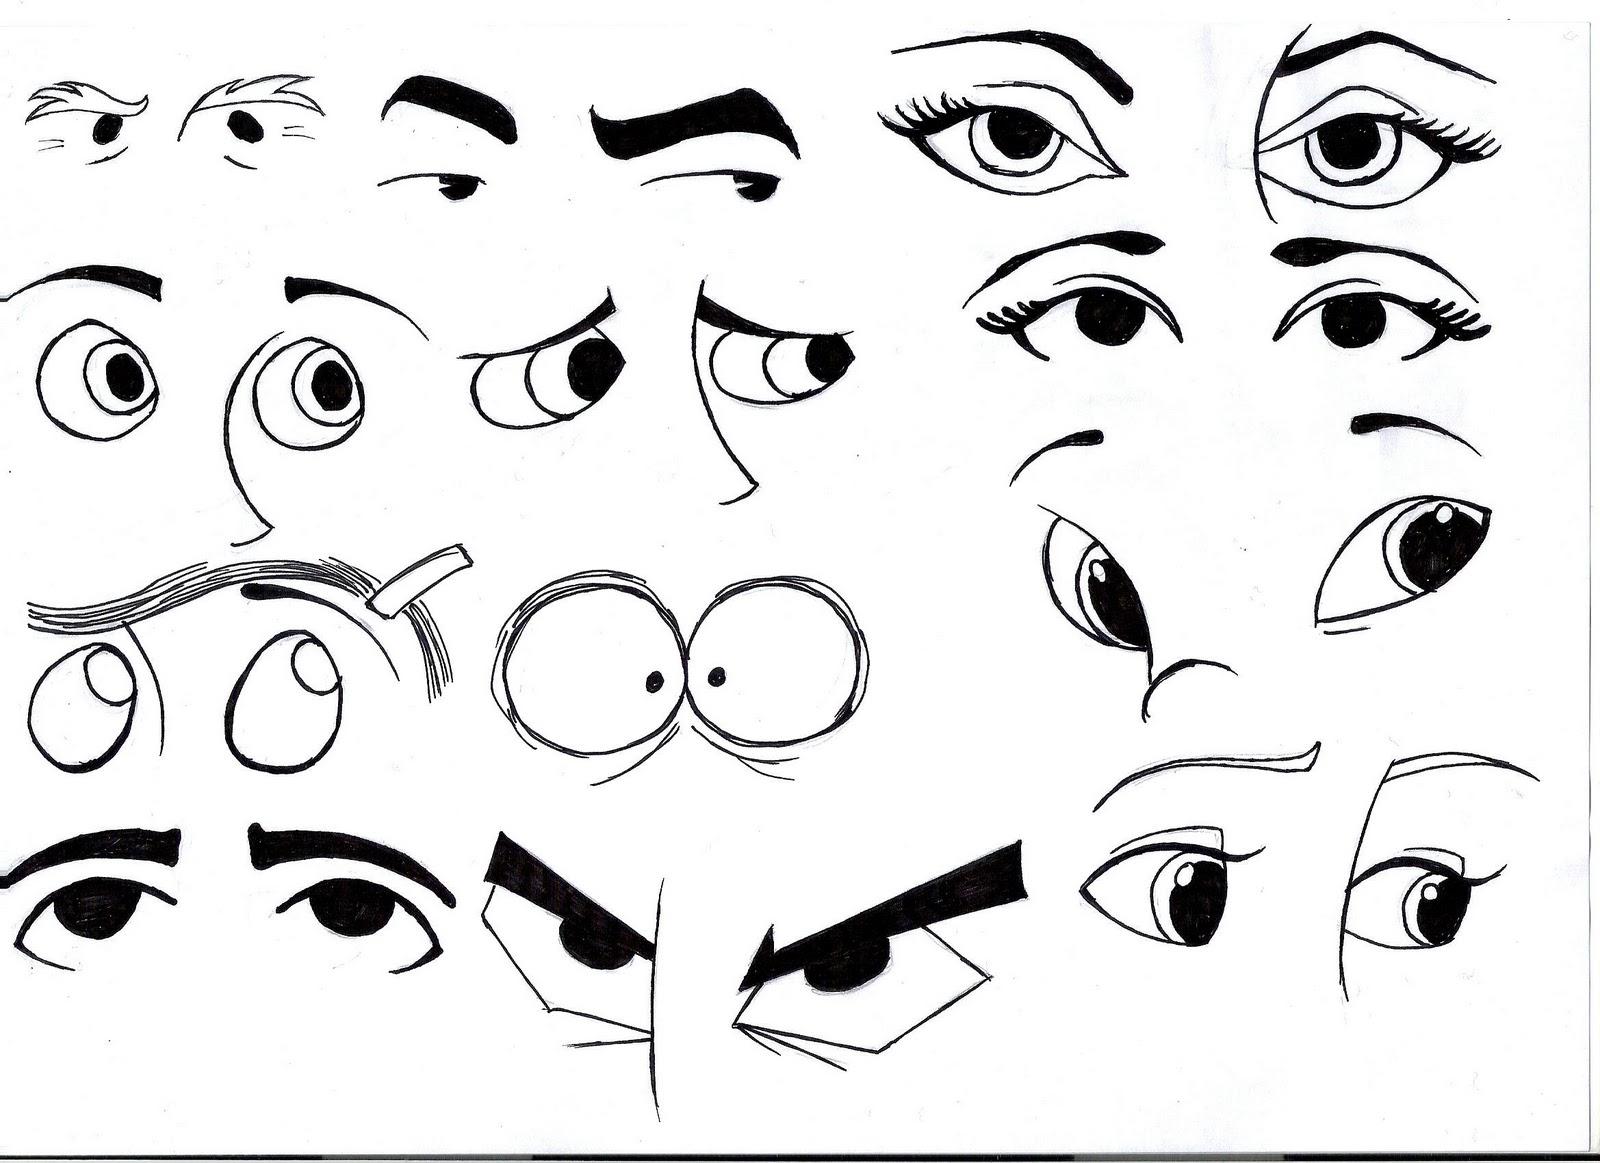 Mewarnai Mata Menggambar Dan Mewarnai